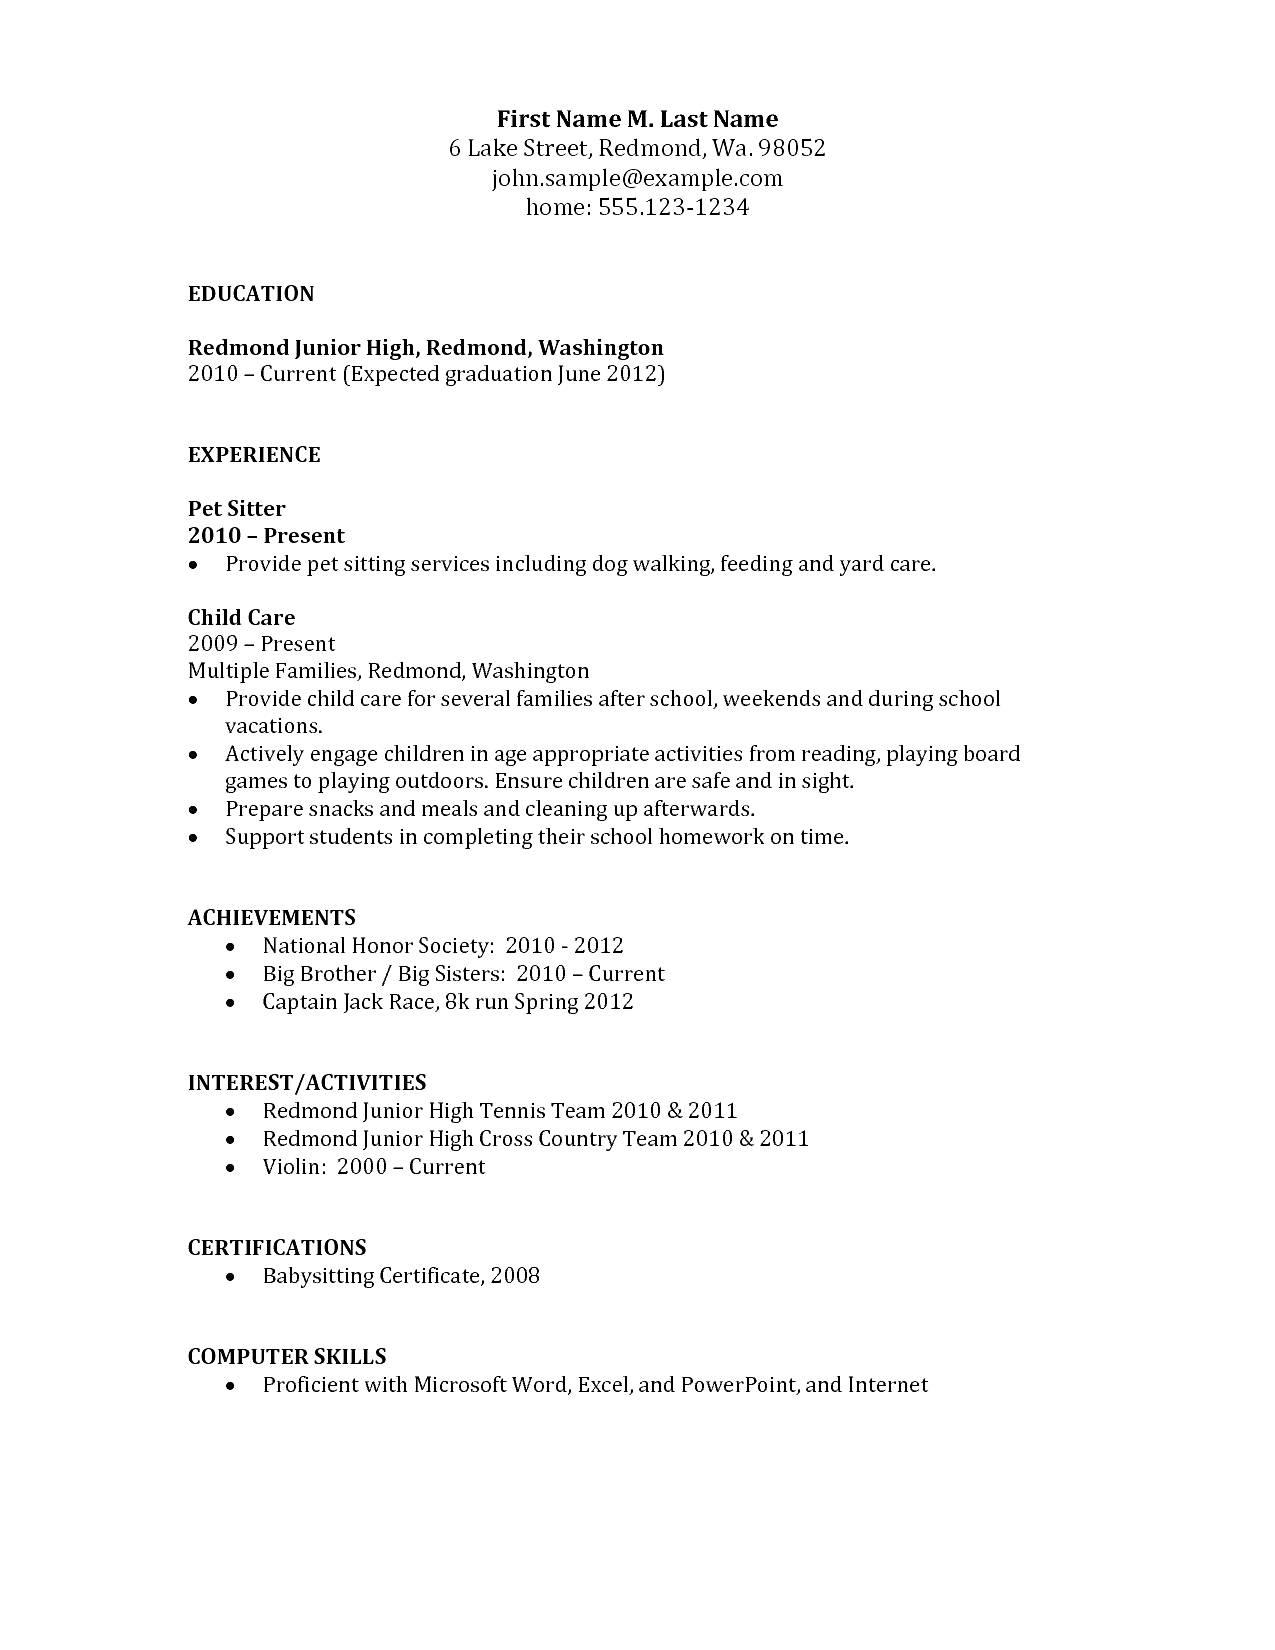 Best buy resume description